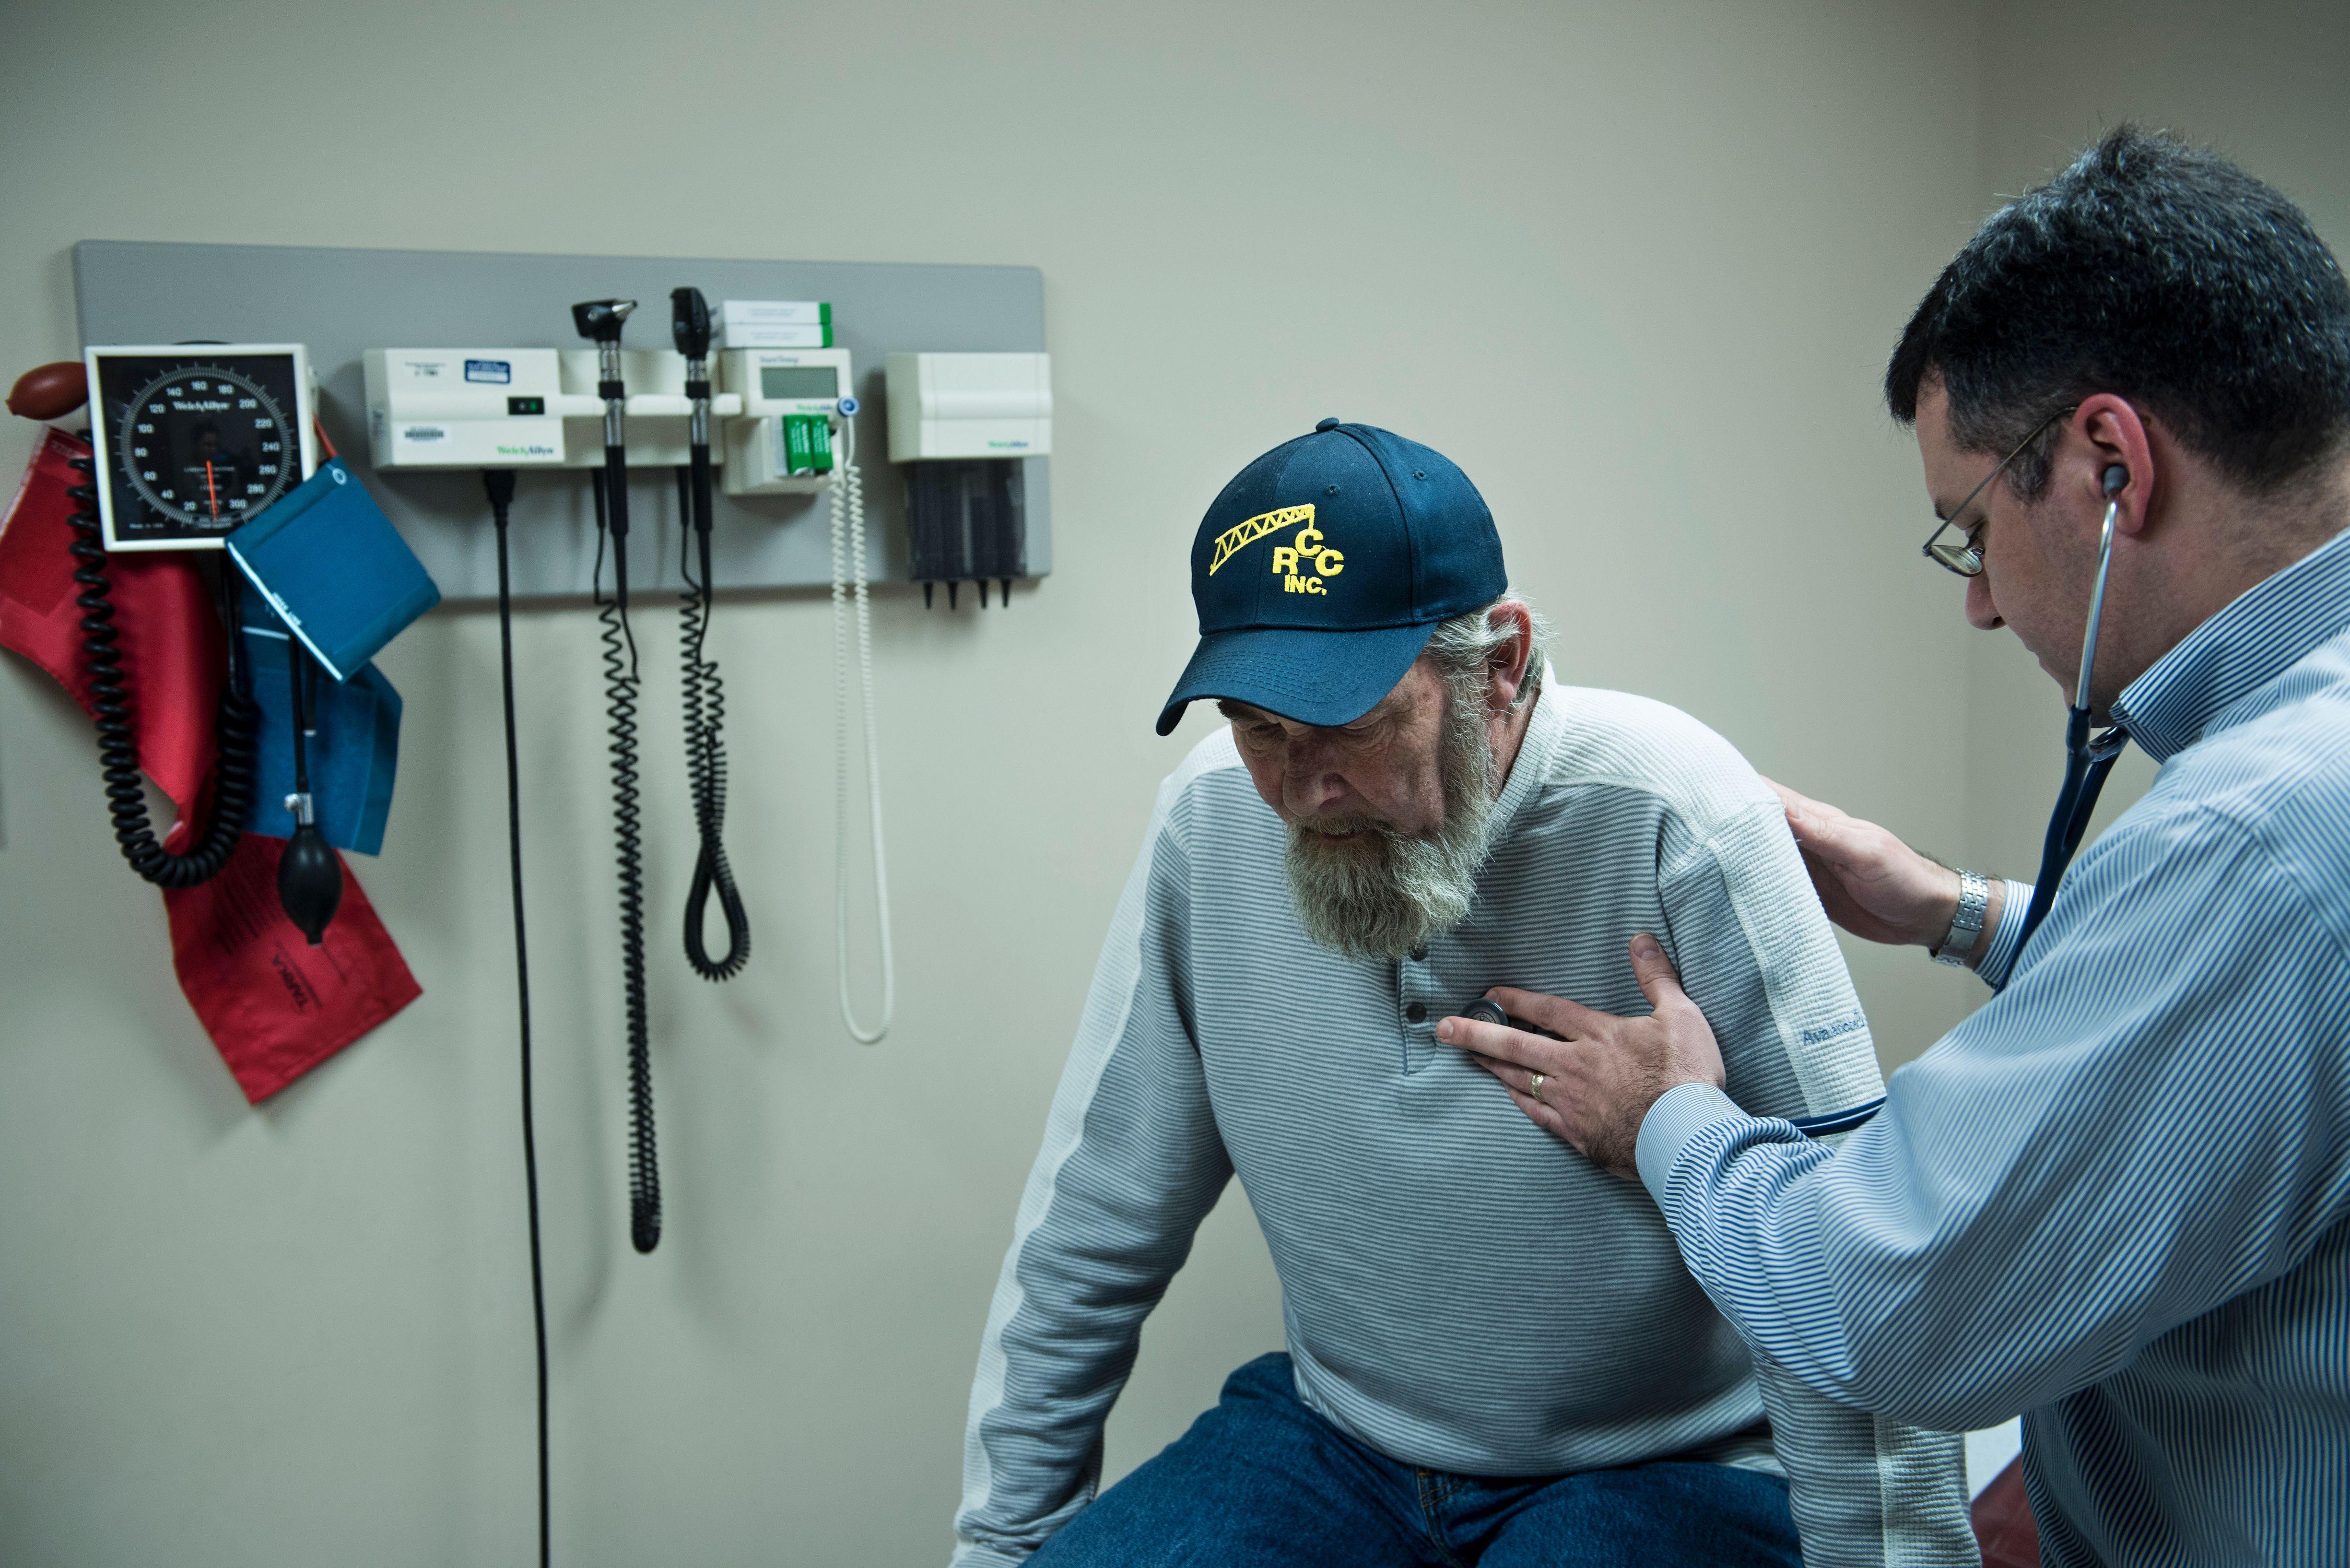 A senior visits a doctor